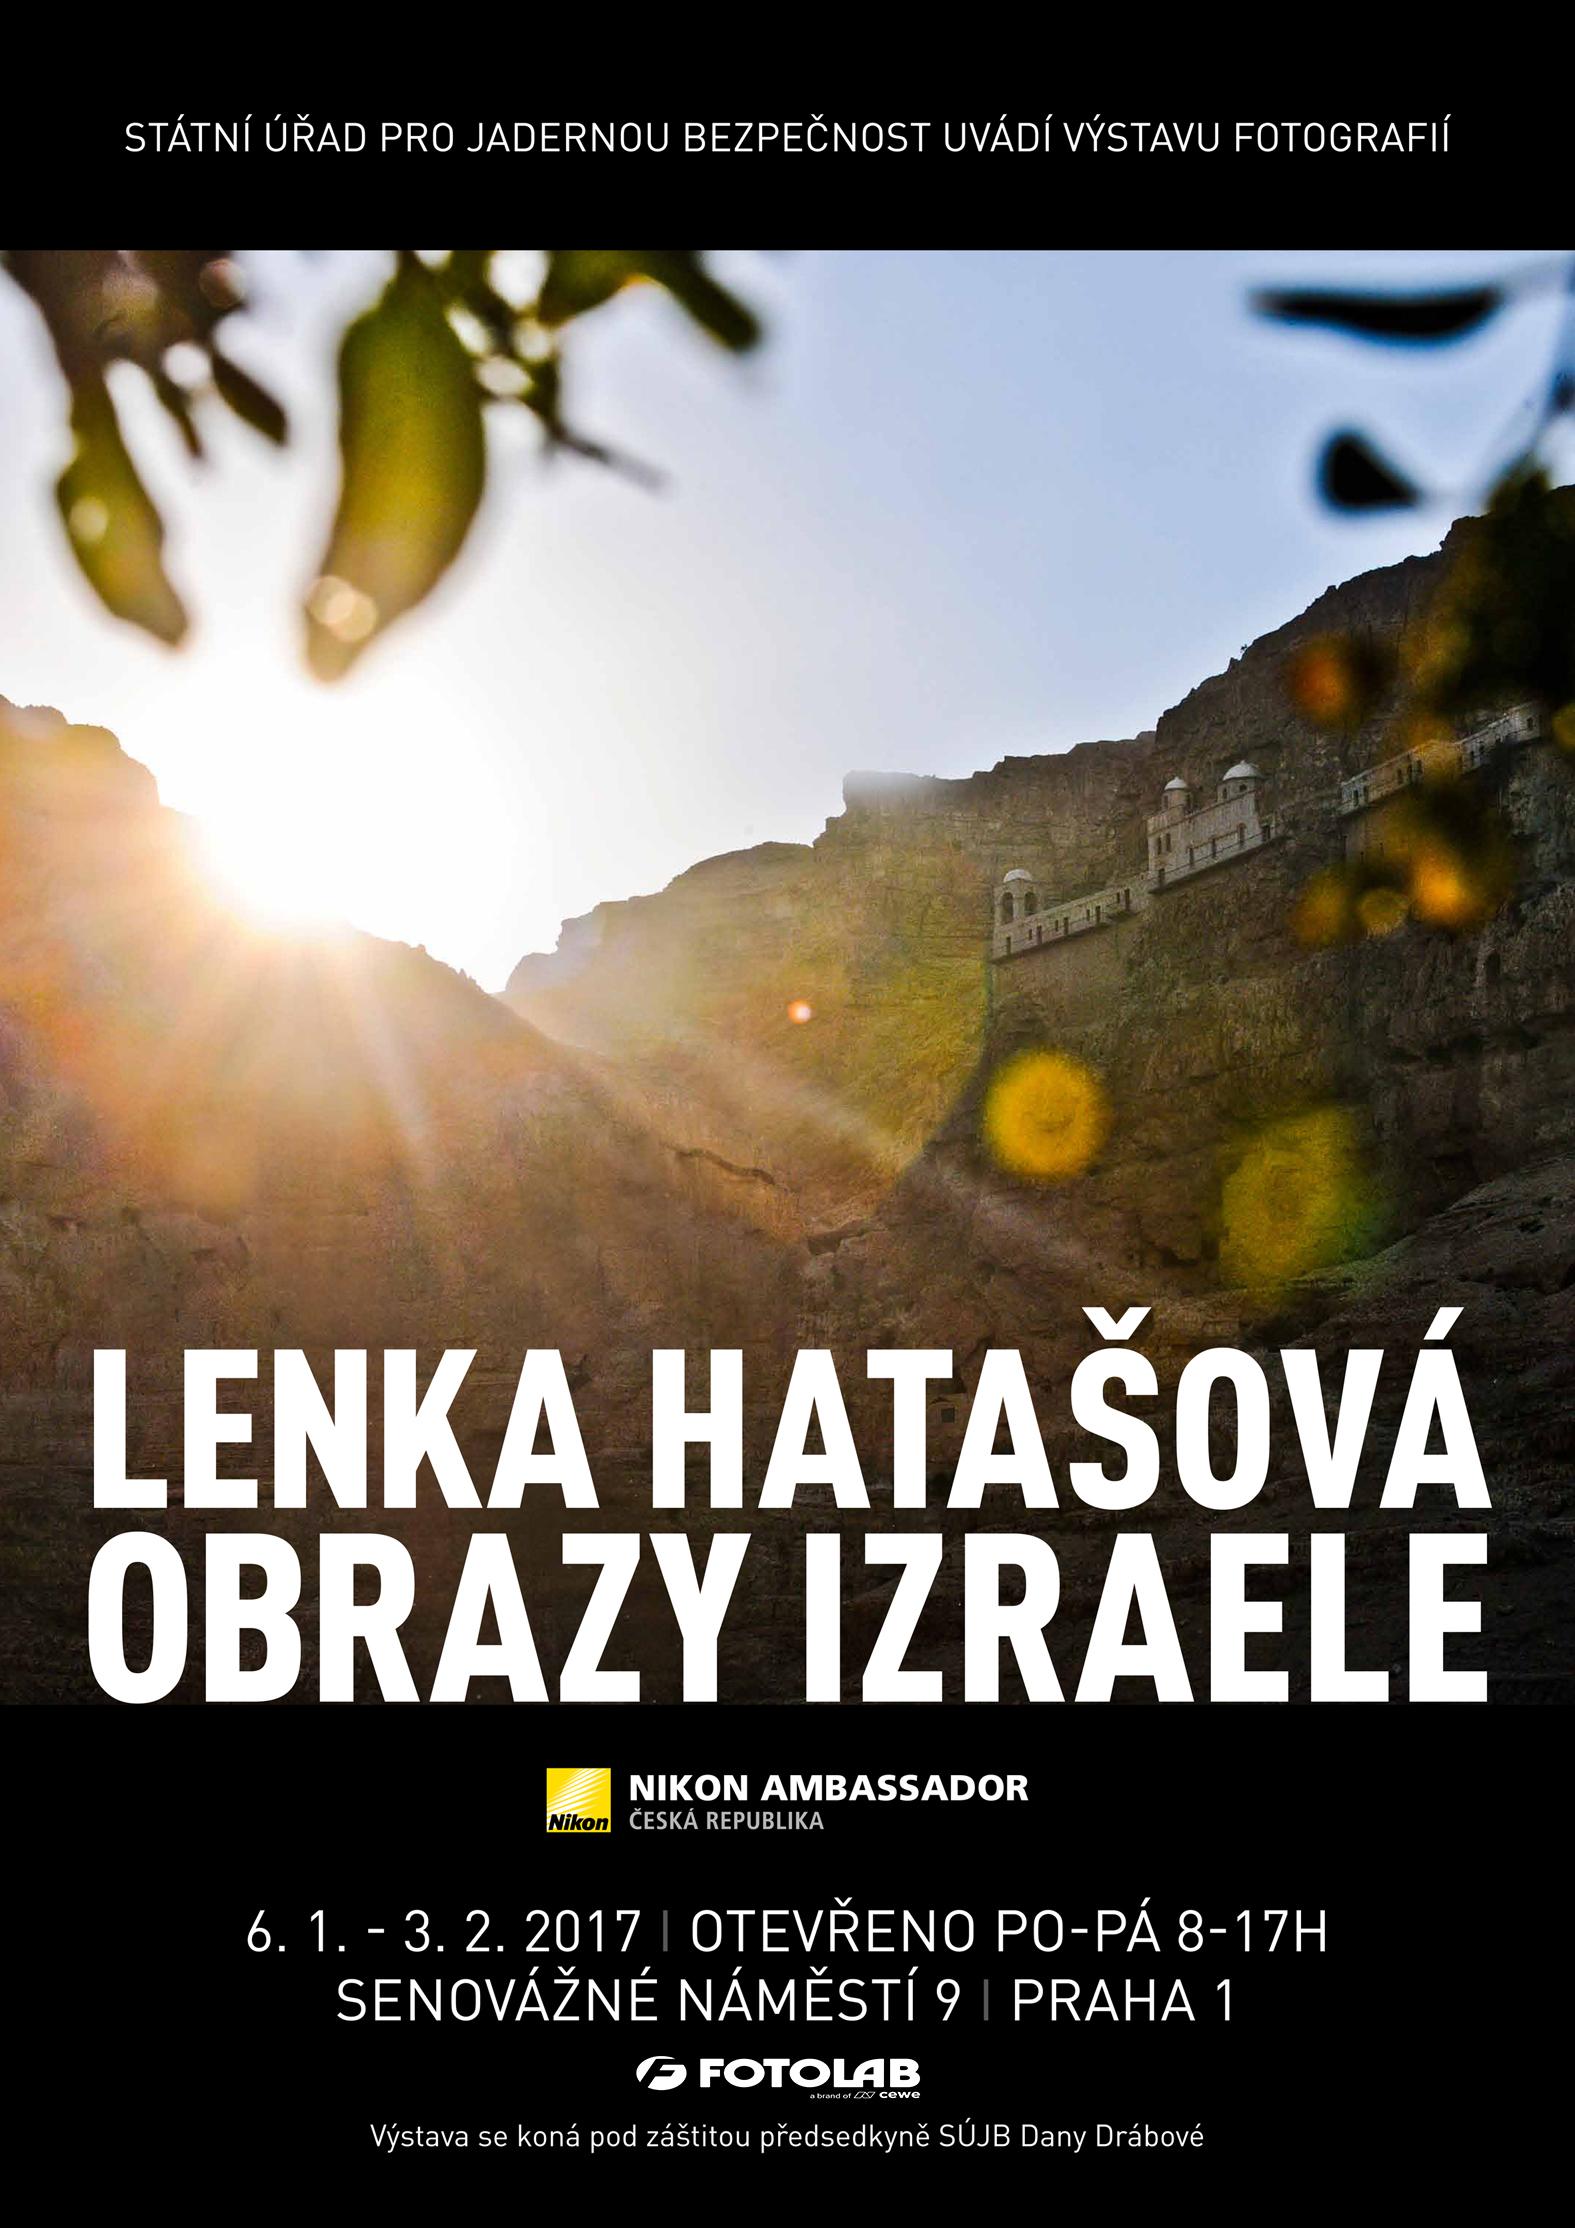 Lenka Hatašová – Obrazy Izraele